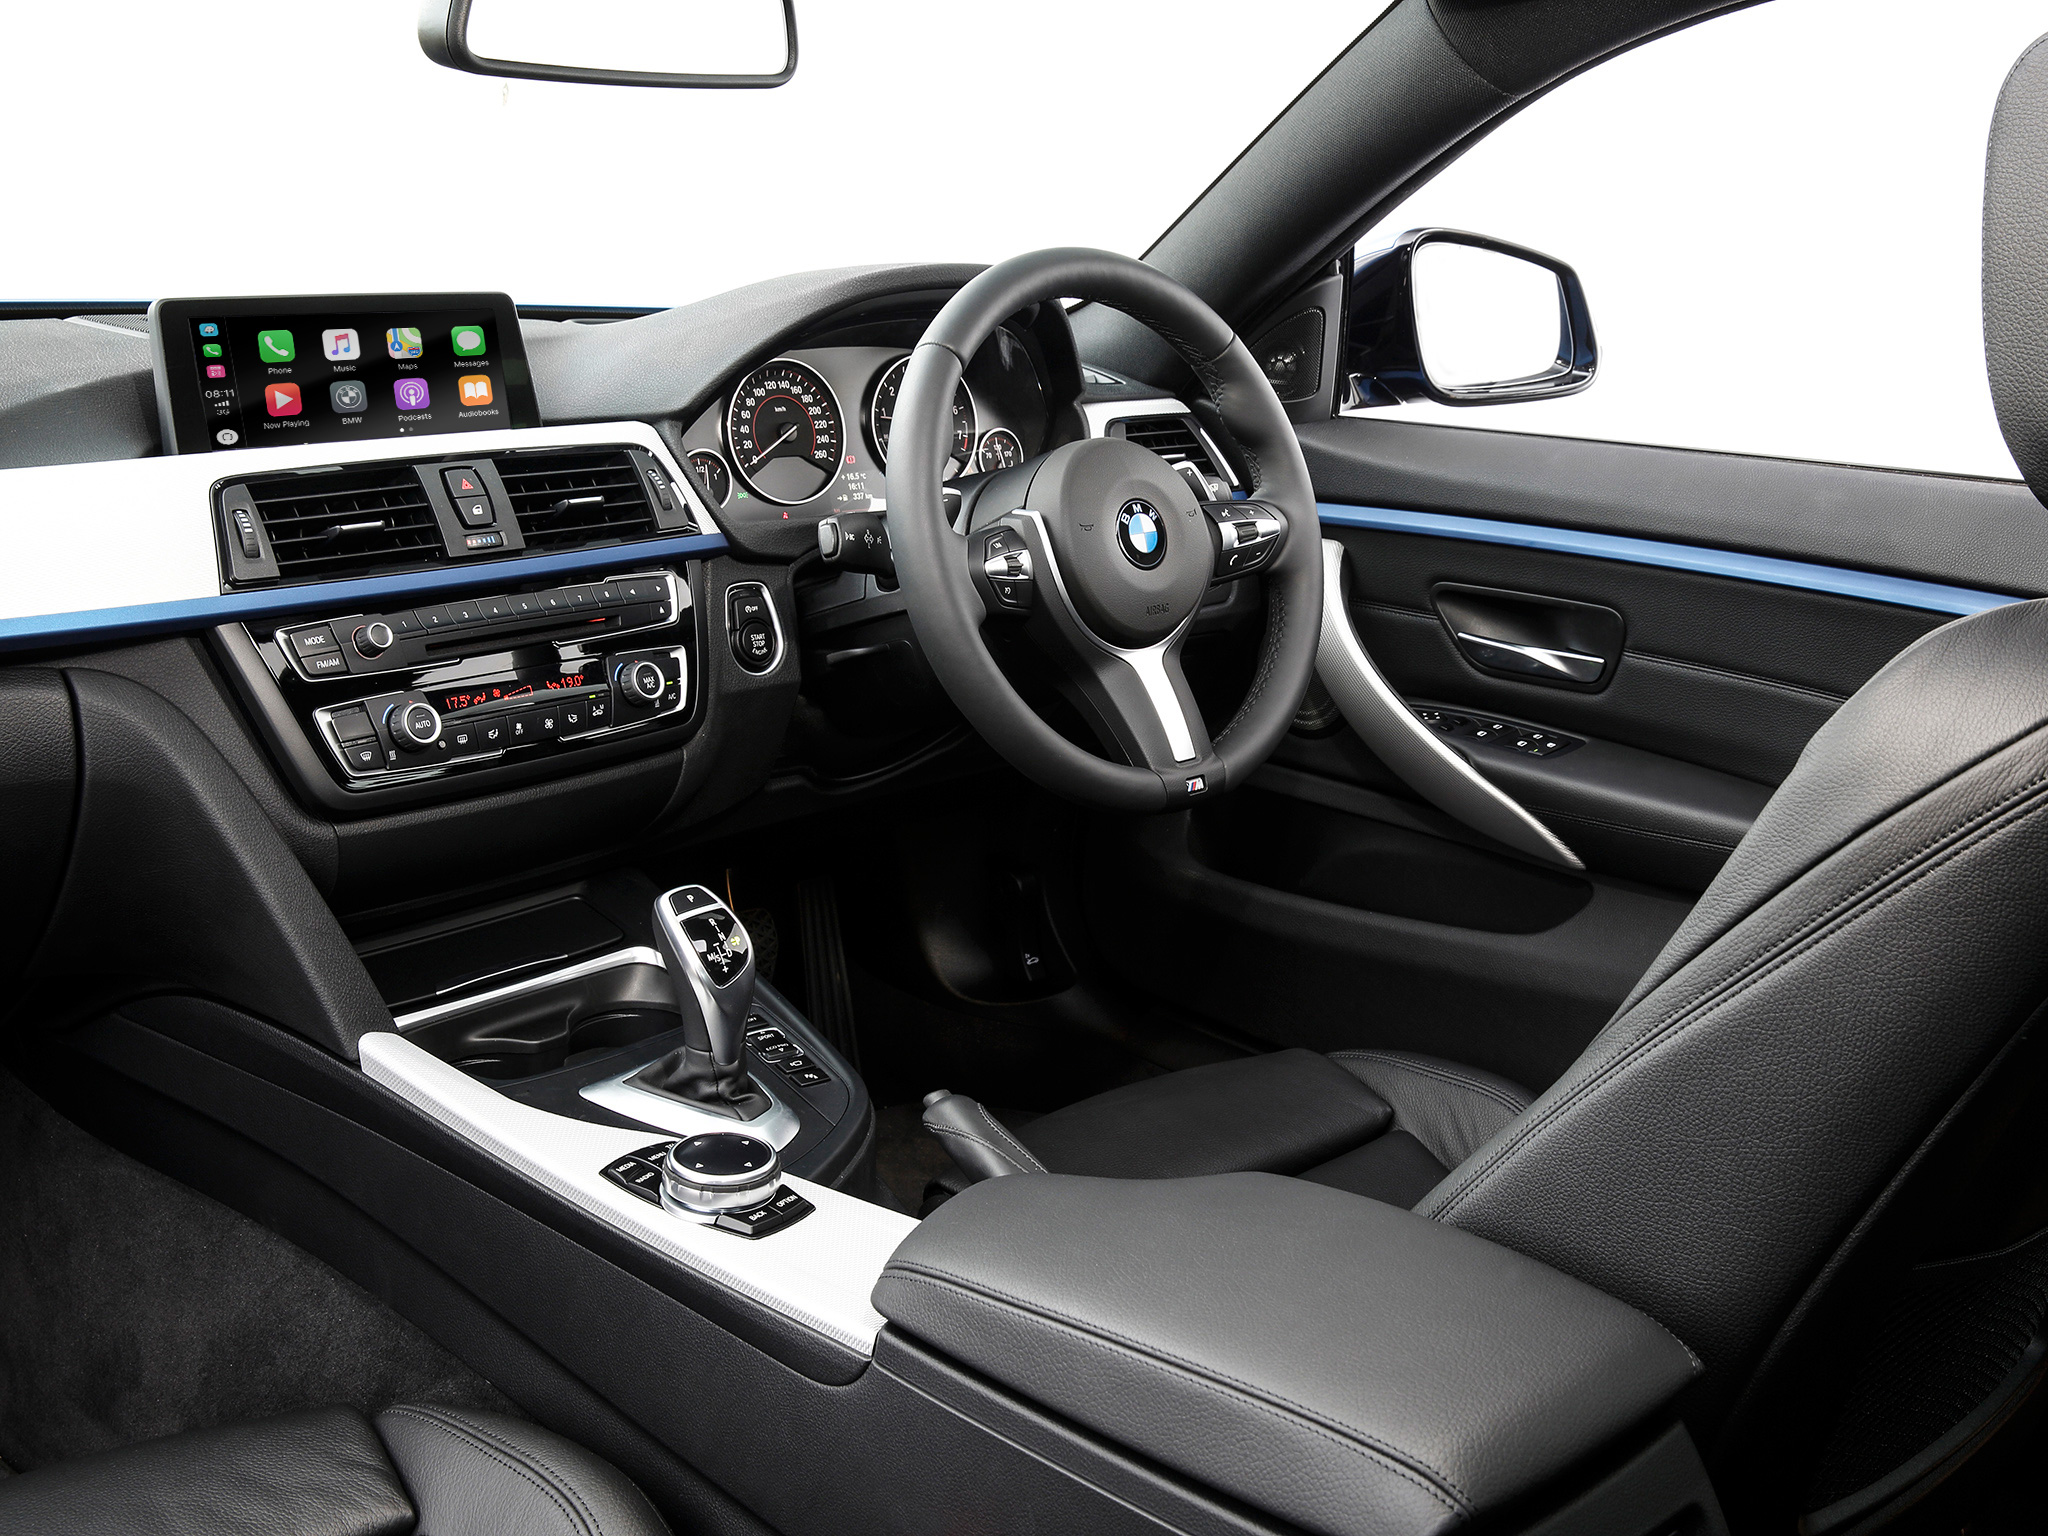 BMW F30 interior with carplay